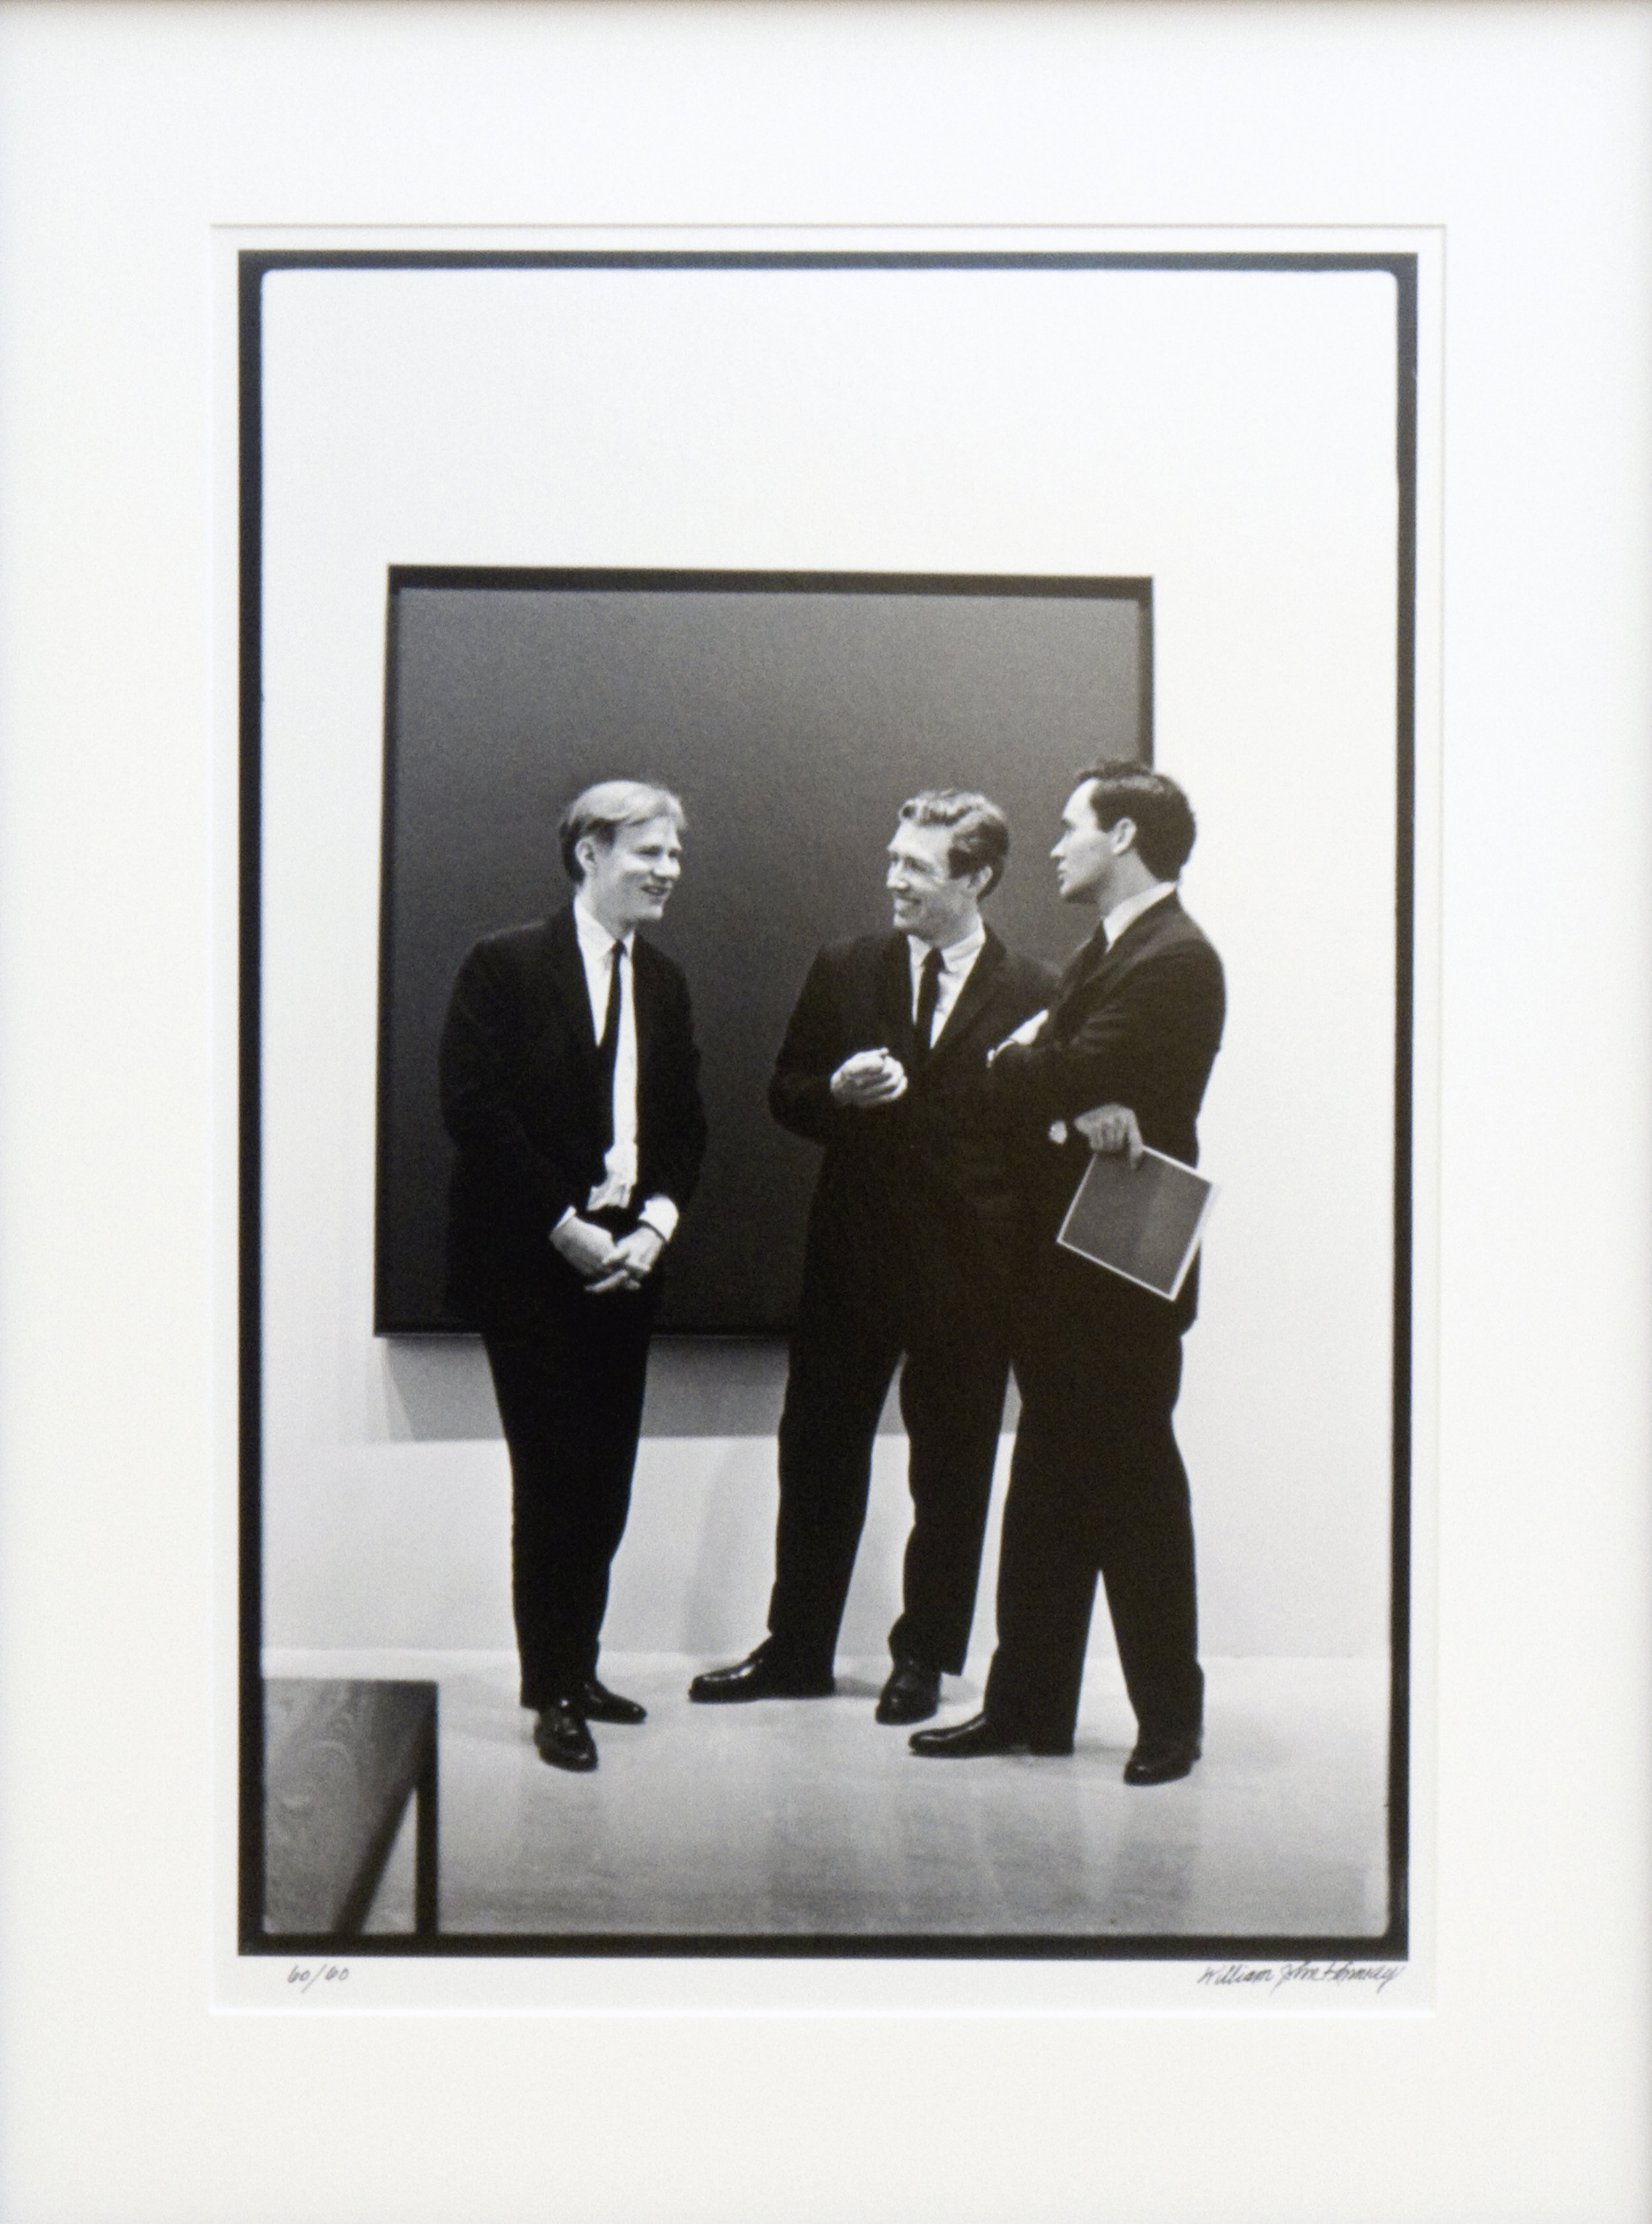 Silver gelatin fiber print by William John Kennedy, titled Andy Warhol, Mario Amaya and Robert Indiana